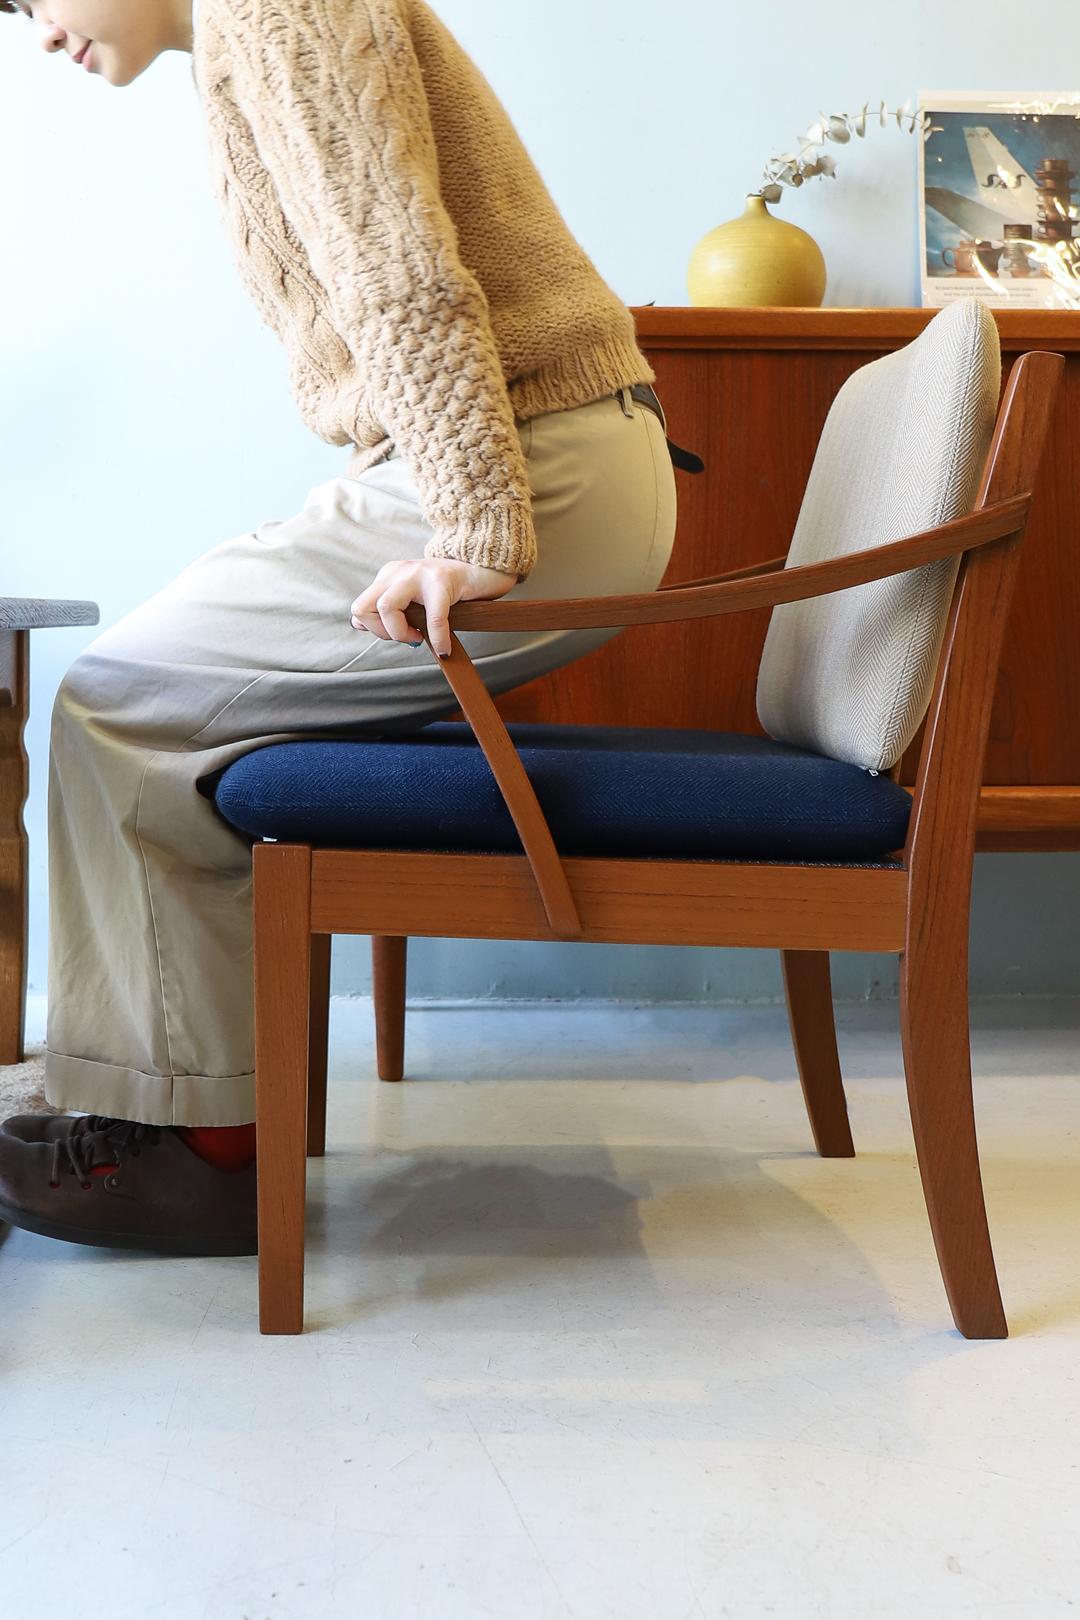 Japanese Vintage Teakwood Lounge Chair/ジャパンヴィンテージ ラウンジチェア アームチェア チーク材 椅子 北欧モダン